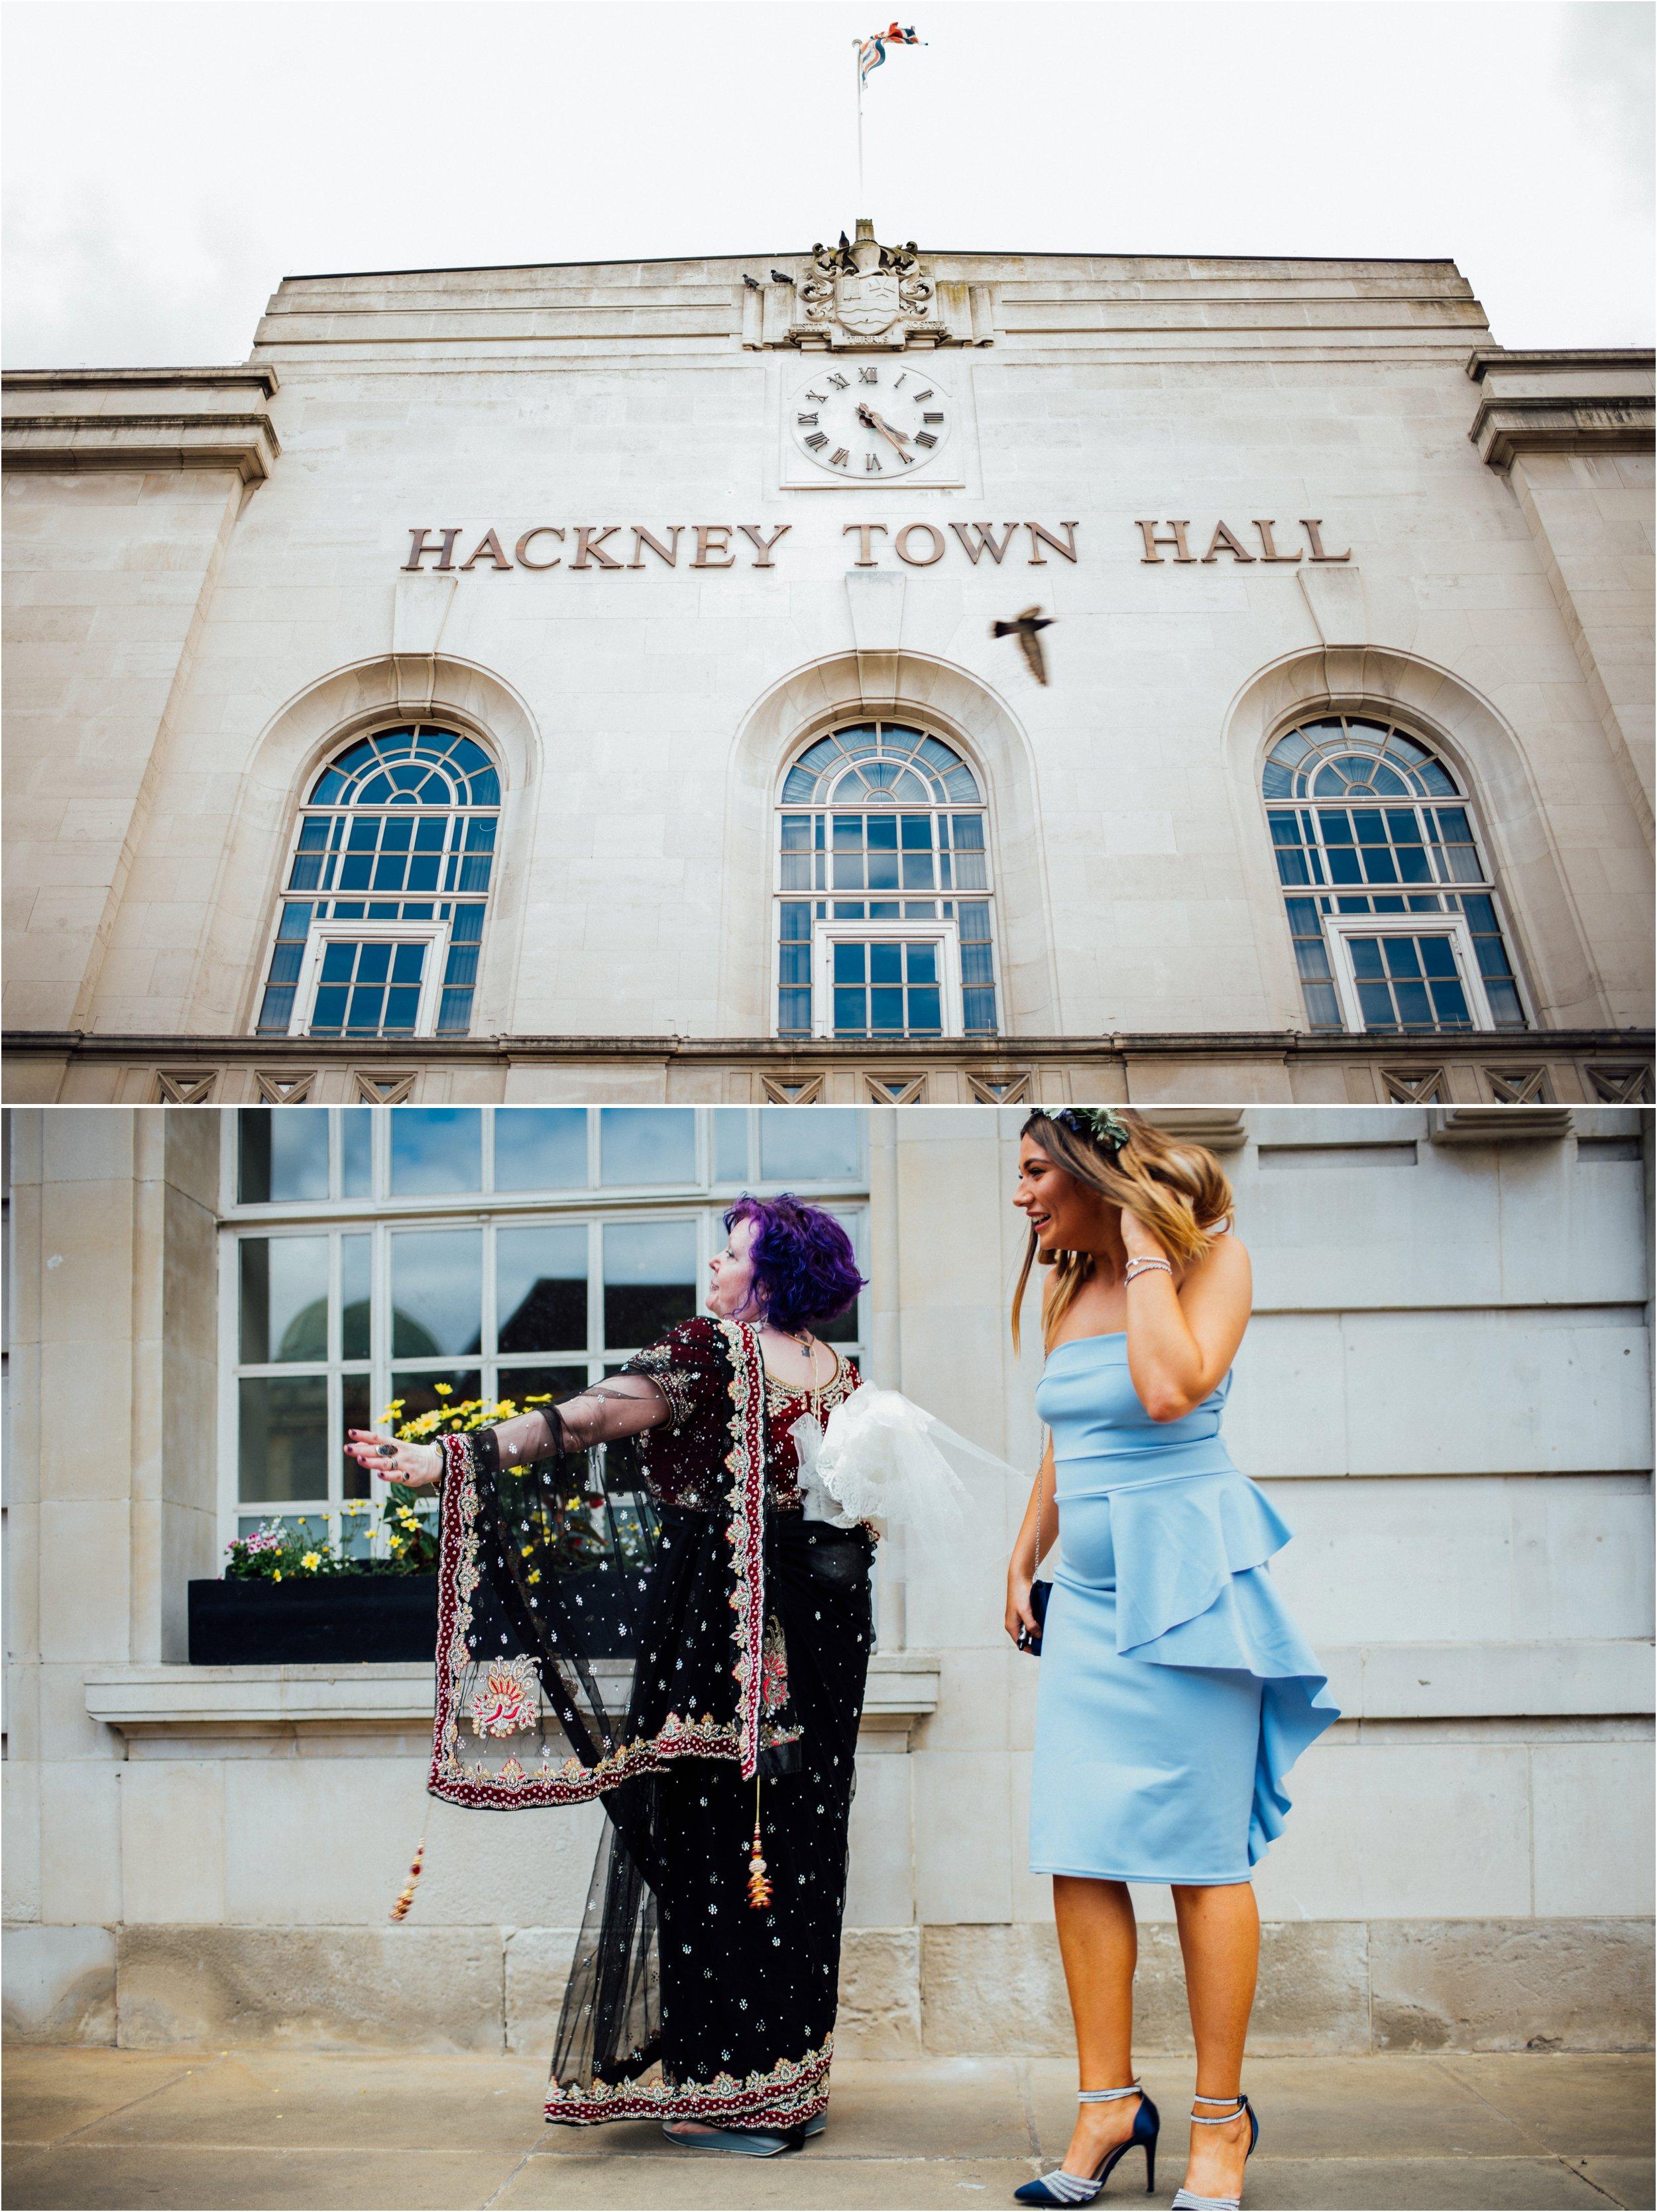 Hackney town hall wedding photography_0066.jpg